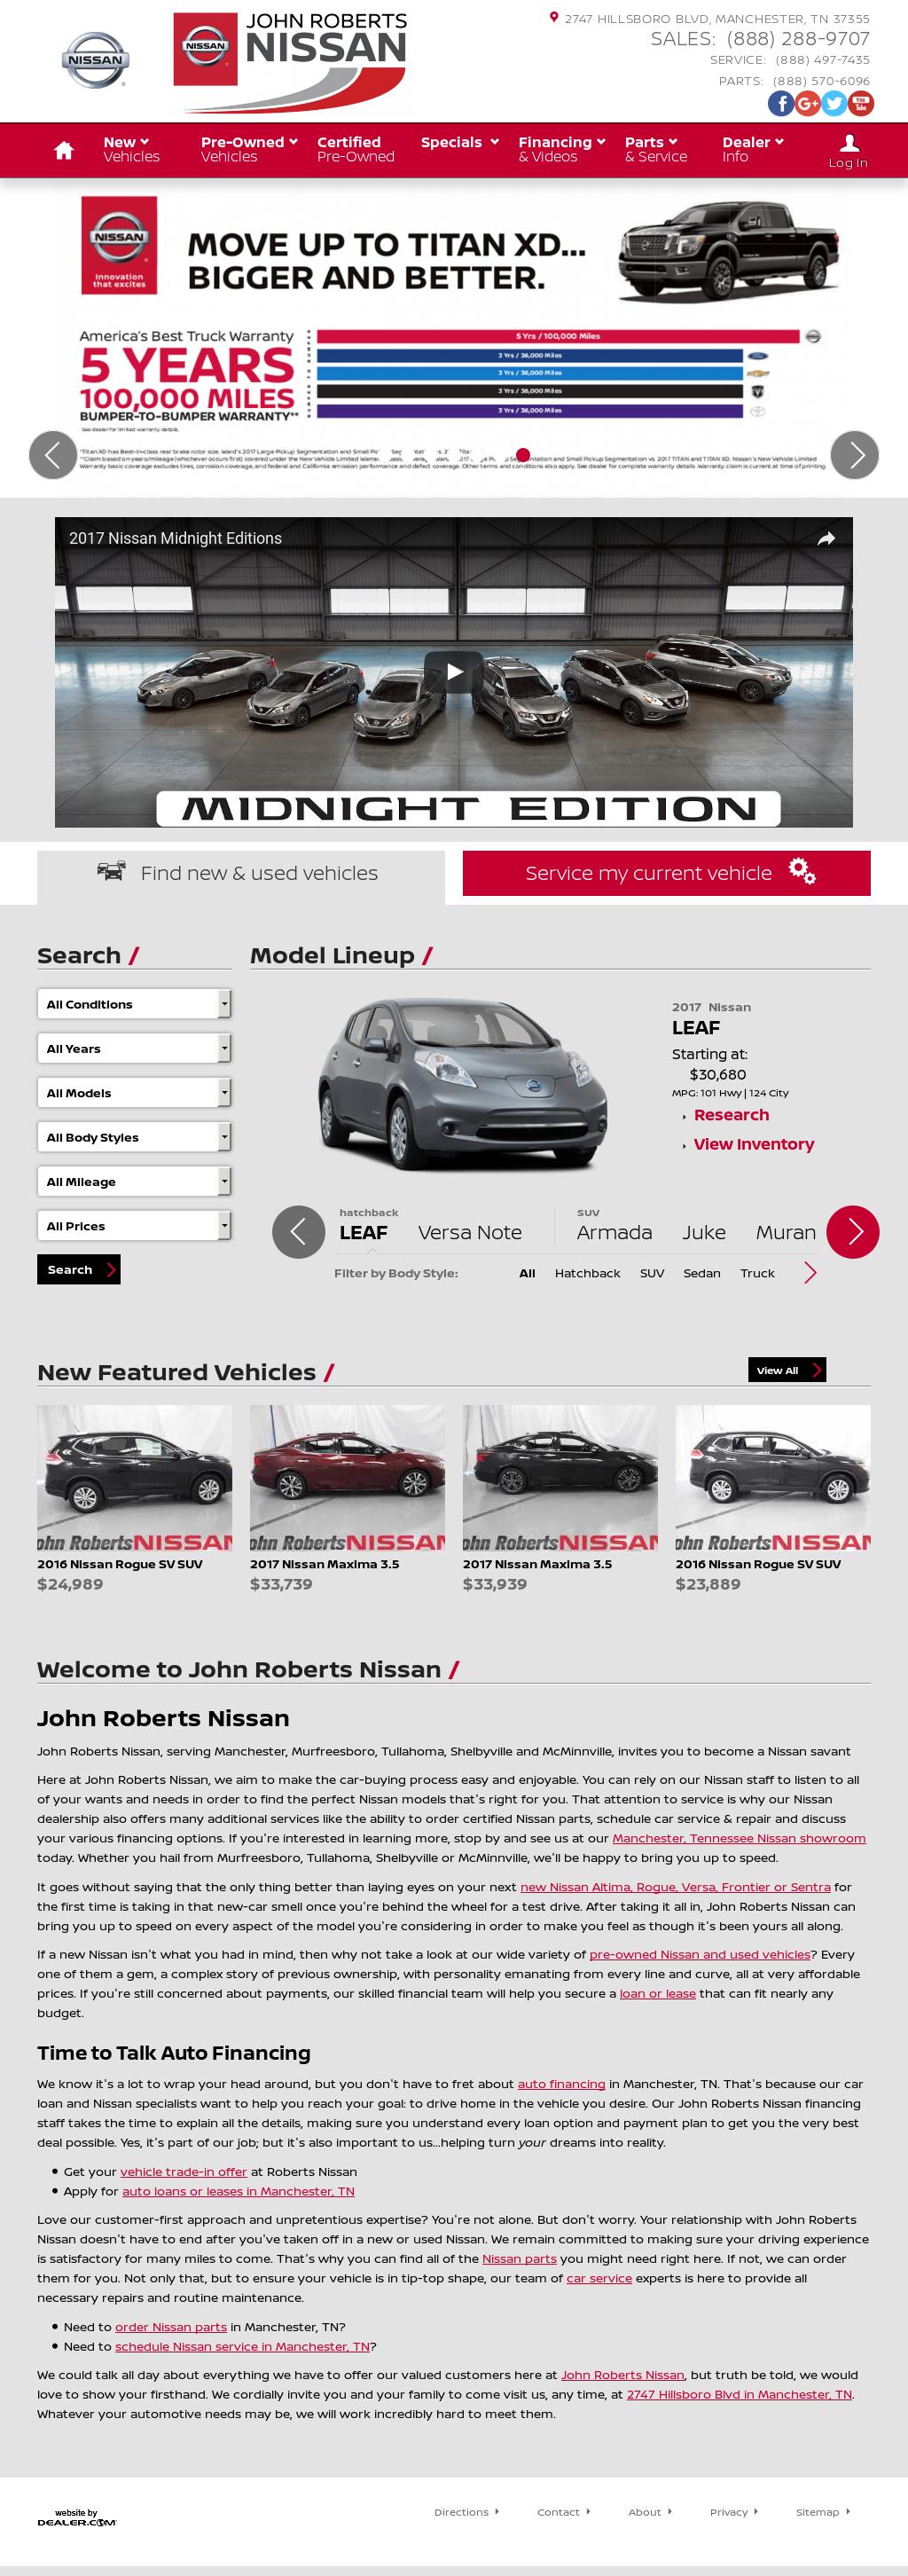 Roberts Nissan Website History